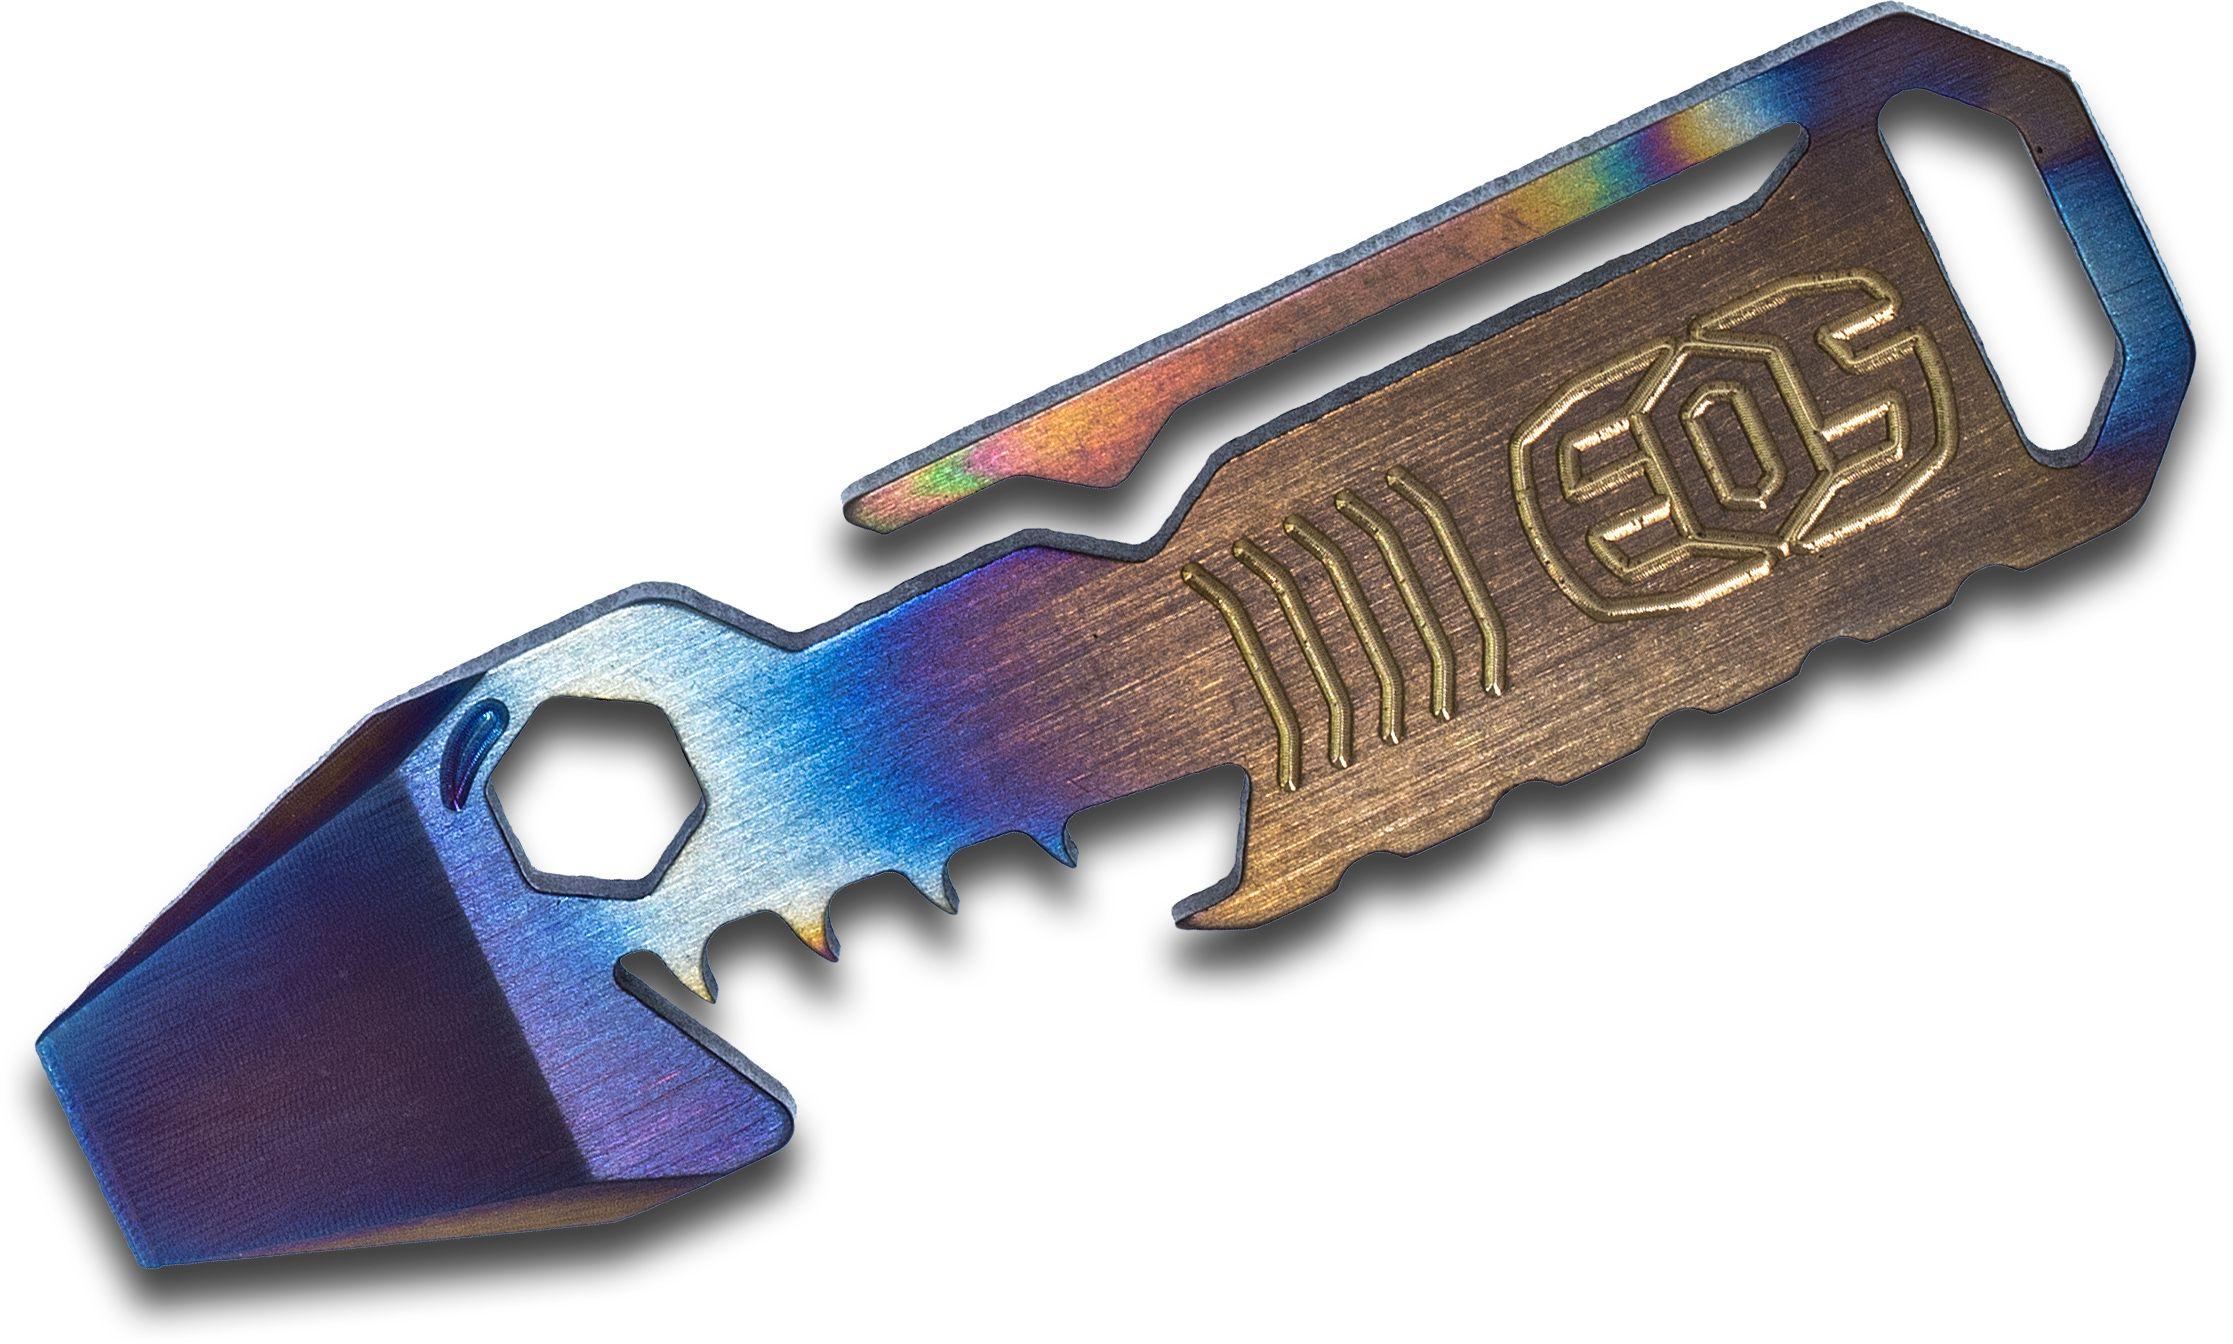 EOS Titanium Mini TiShark Pry Bar Multi-Tool, Flamed